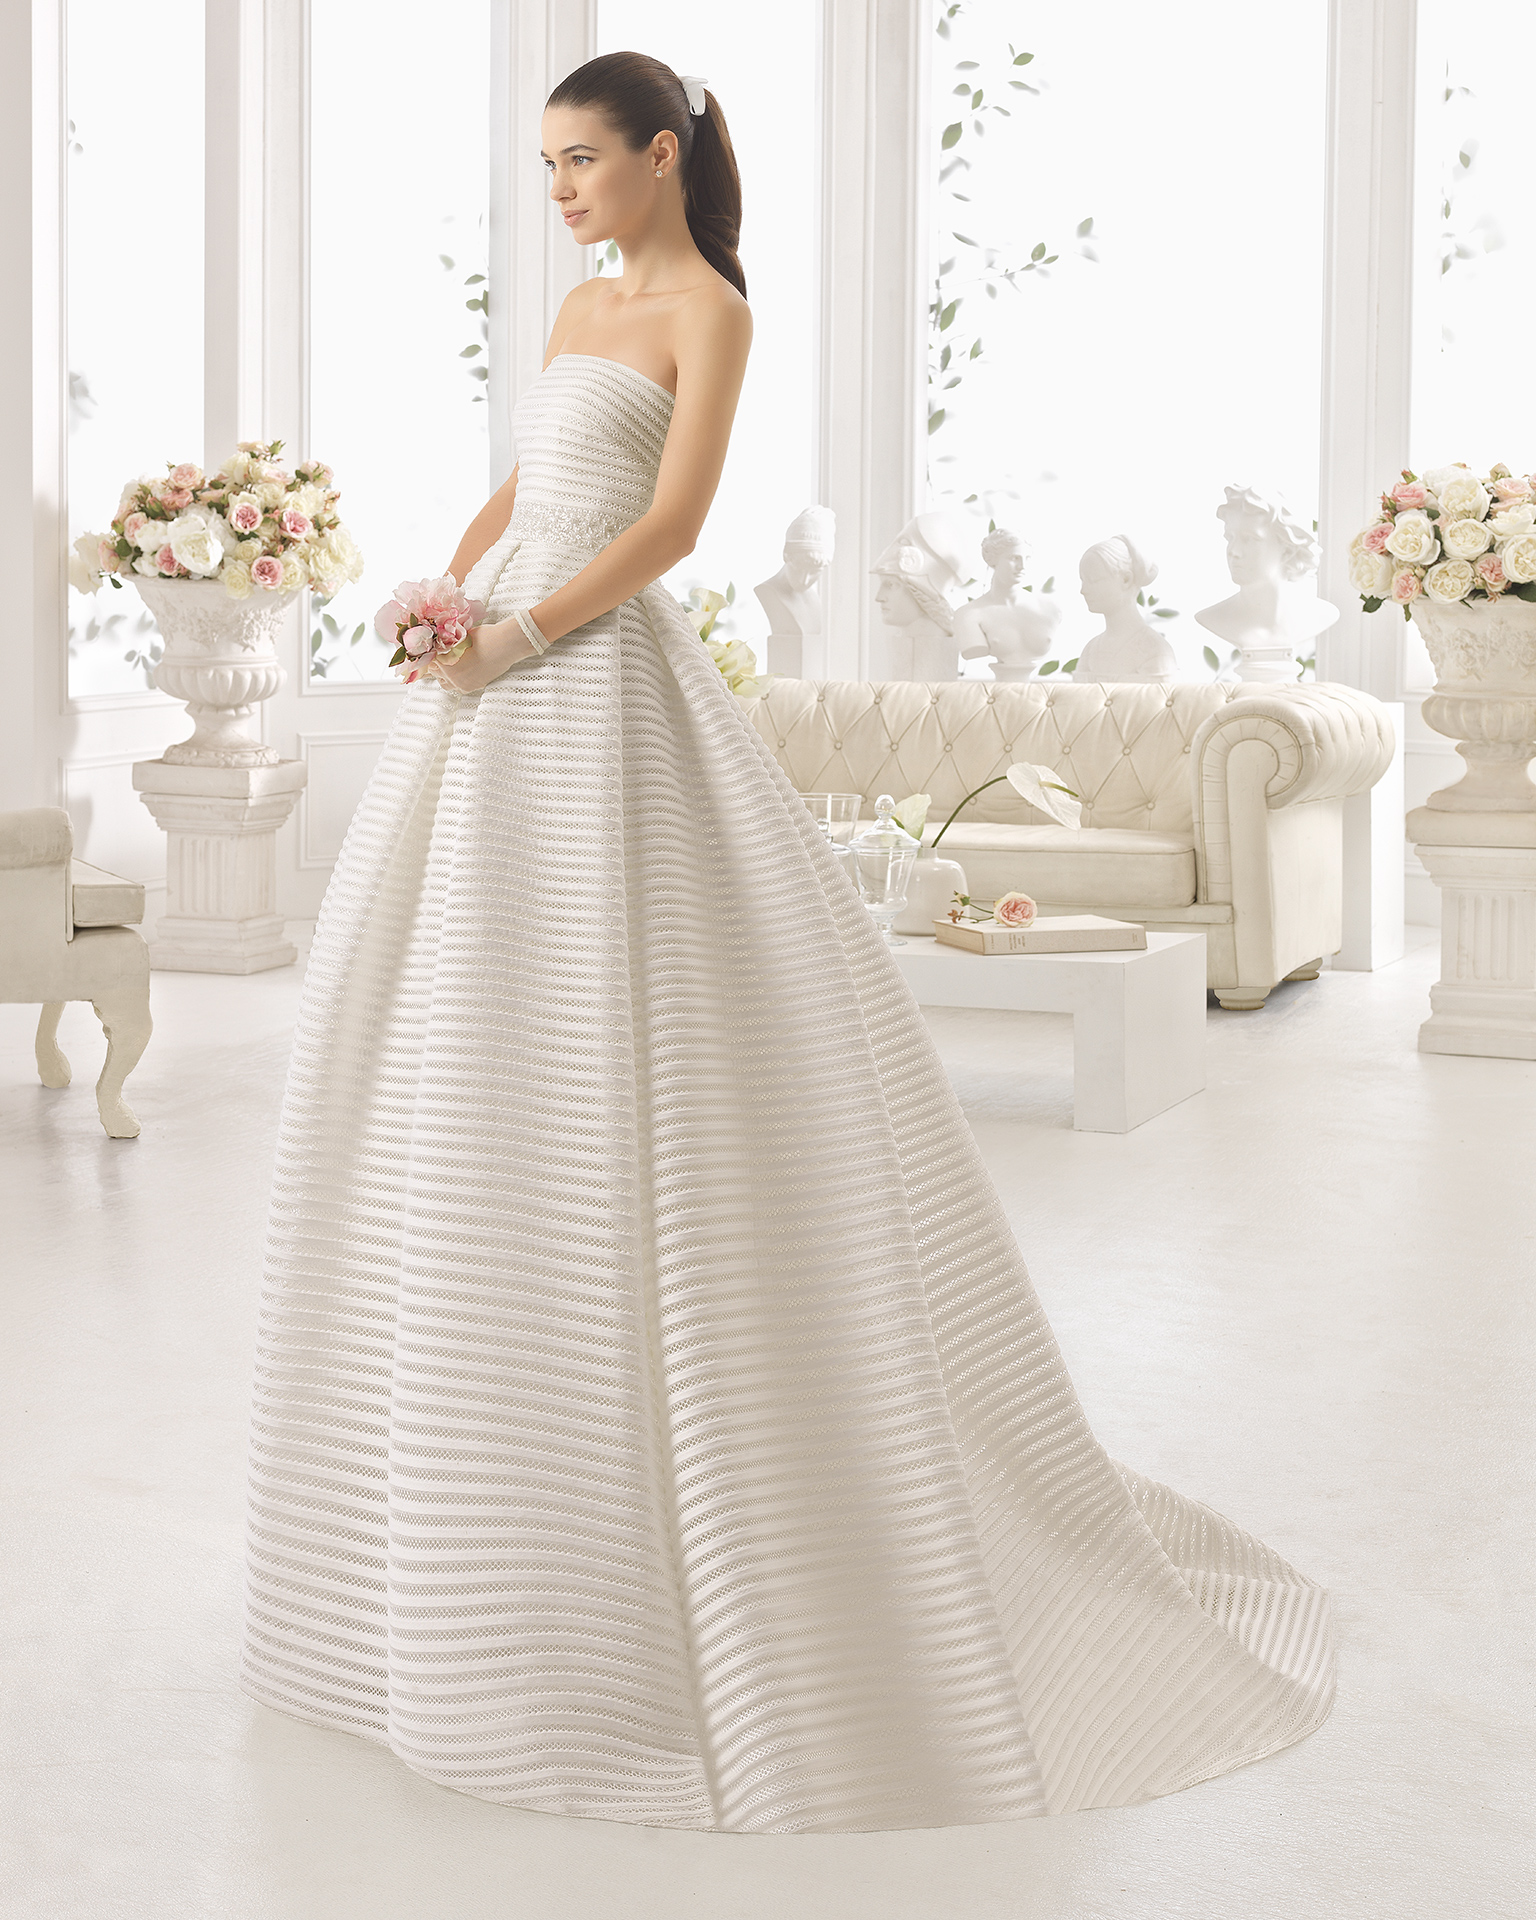 COBRE wedding dress - Aire Barcelona 2017